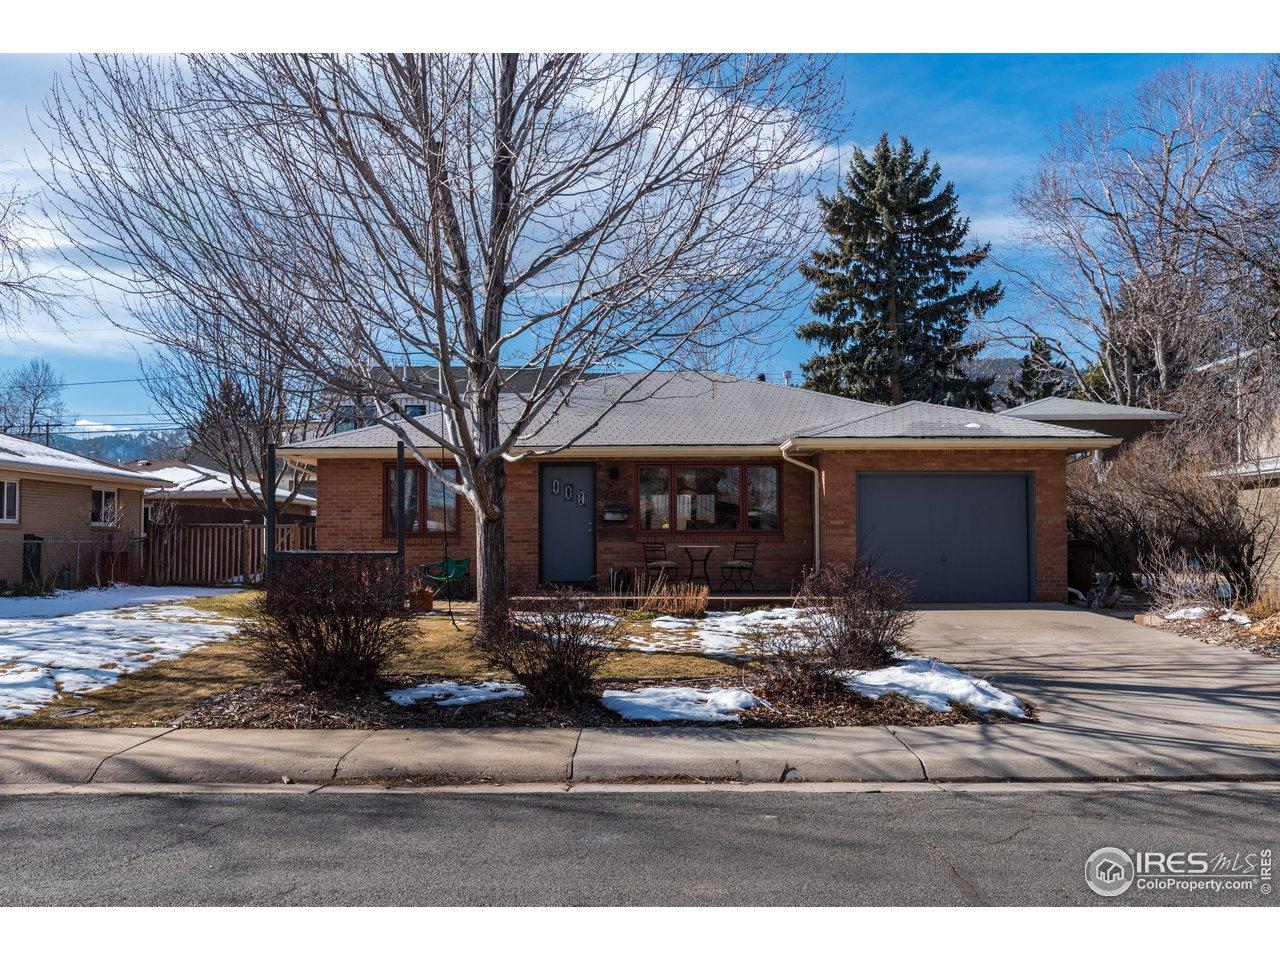 2915 16th St, Boulder CO 80304